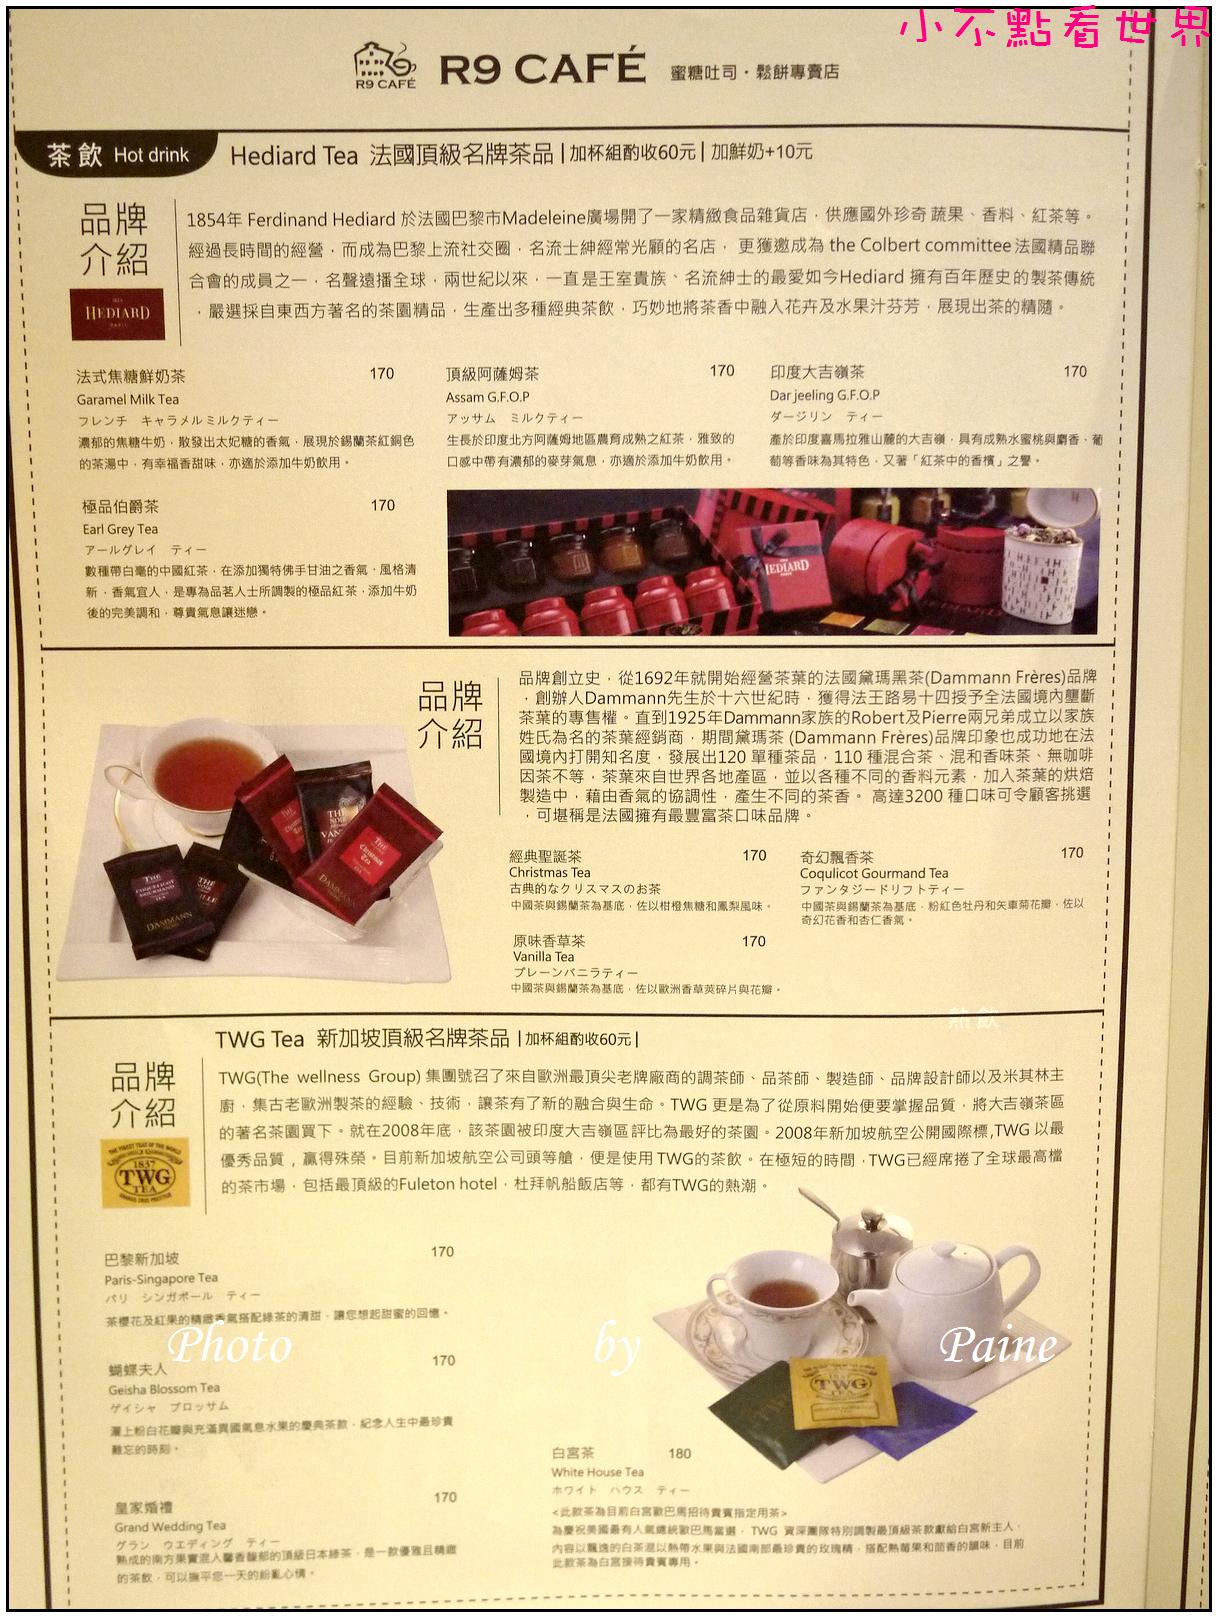 桃園R9 CAFE (16).JPG